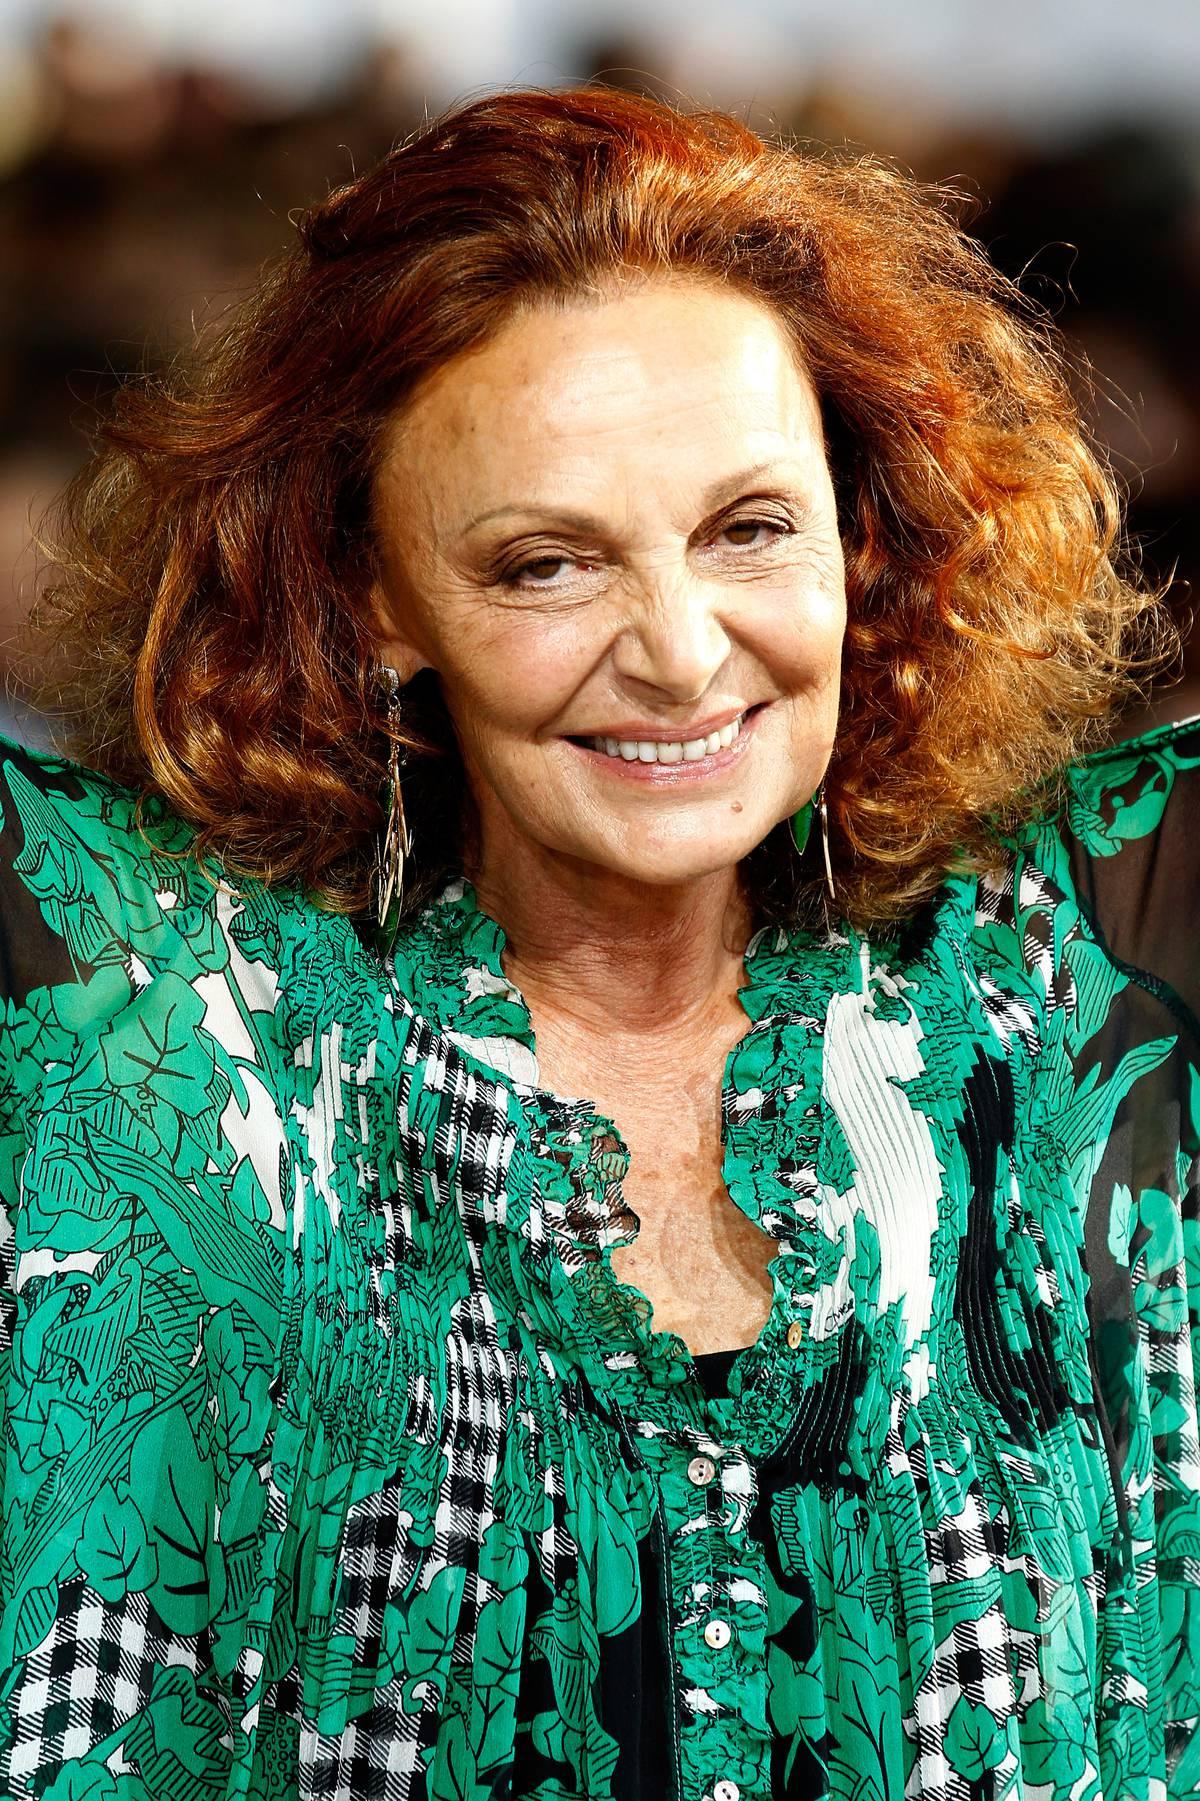 Racy Past Of Stars Favourite Fashion Designer Revealed Nz Herald